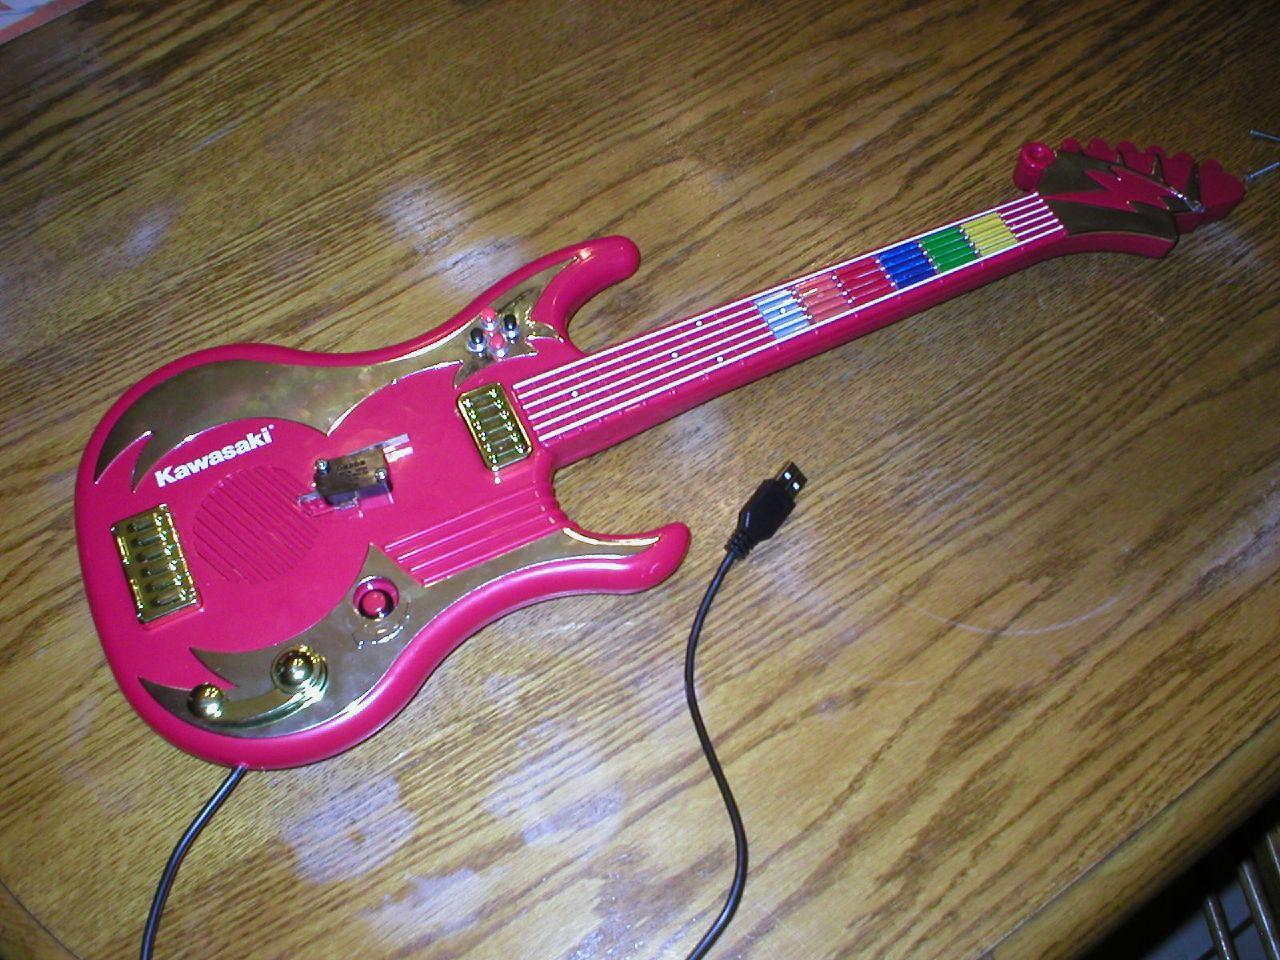 hight resolution of guitar hero guitar wiring diagram wiring diagrams scematic single humbucker wiring diagram guitar hero guitar wiring diagram